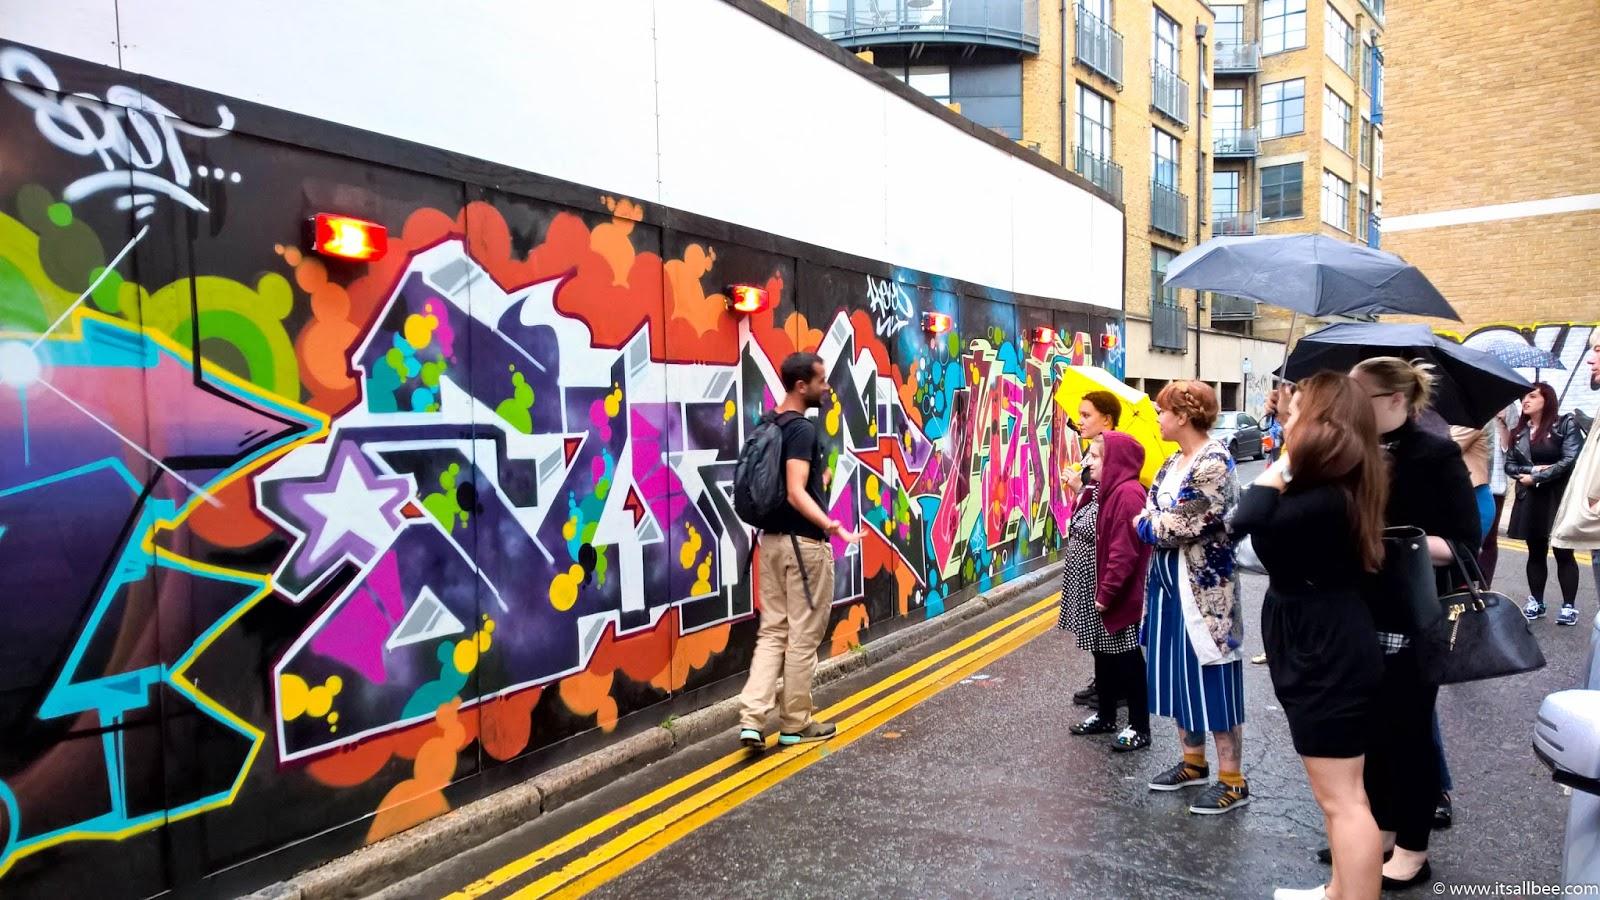 east london street art map rome - photo#18